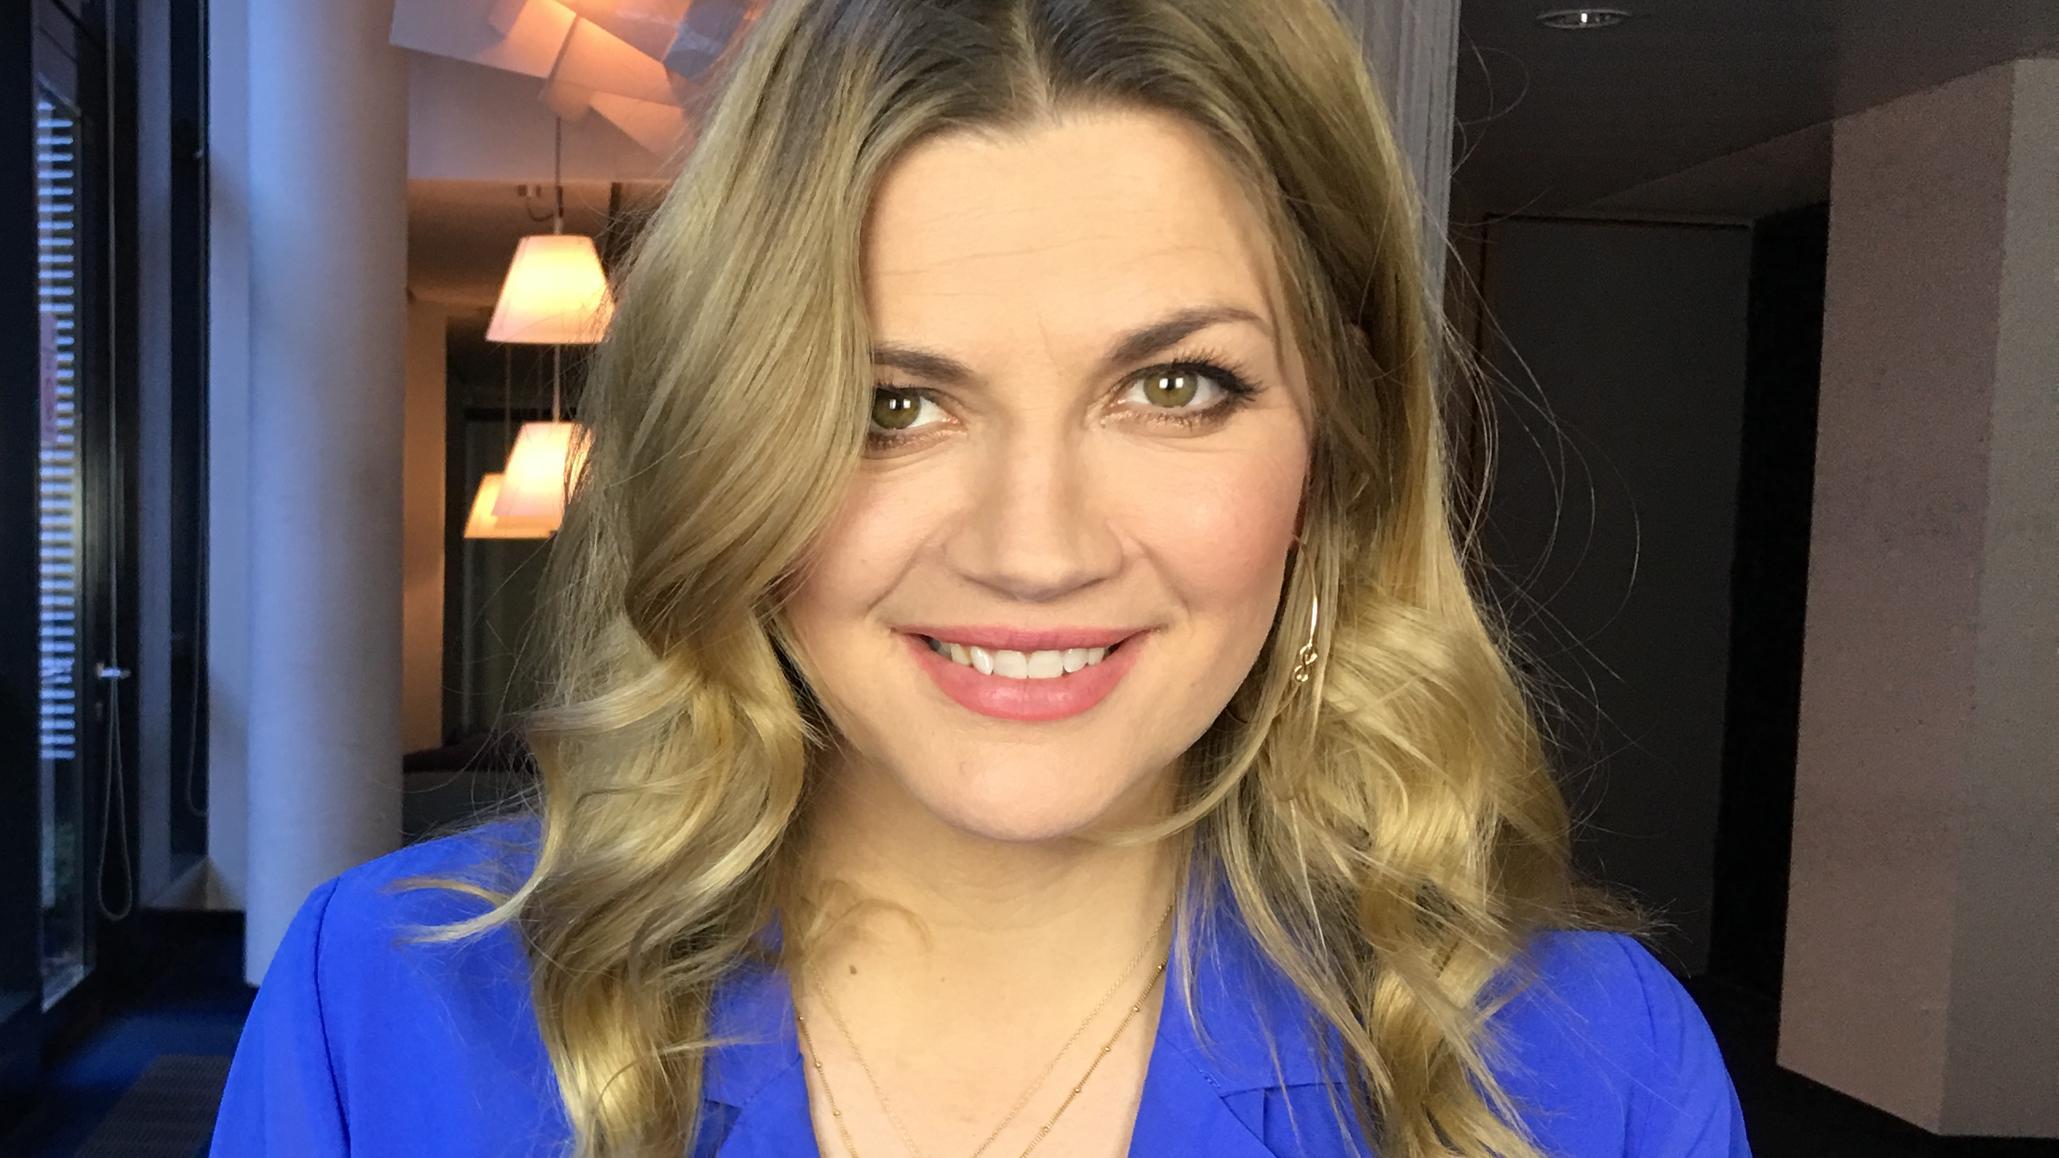 Prominent Moderatorin